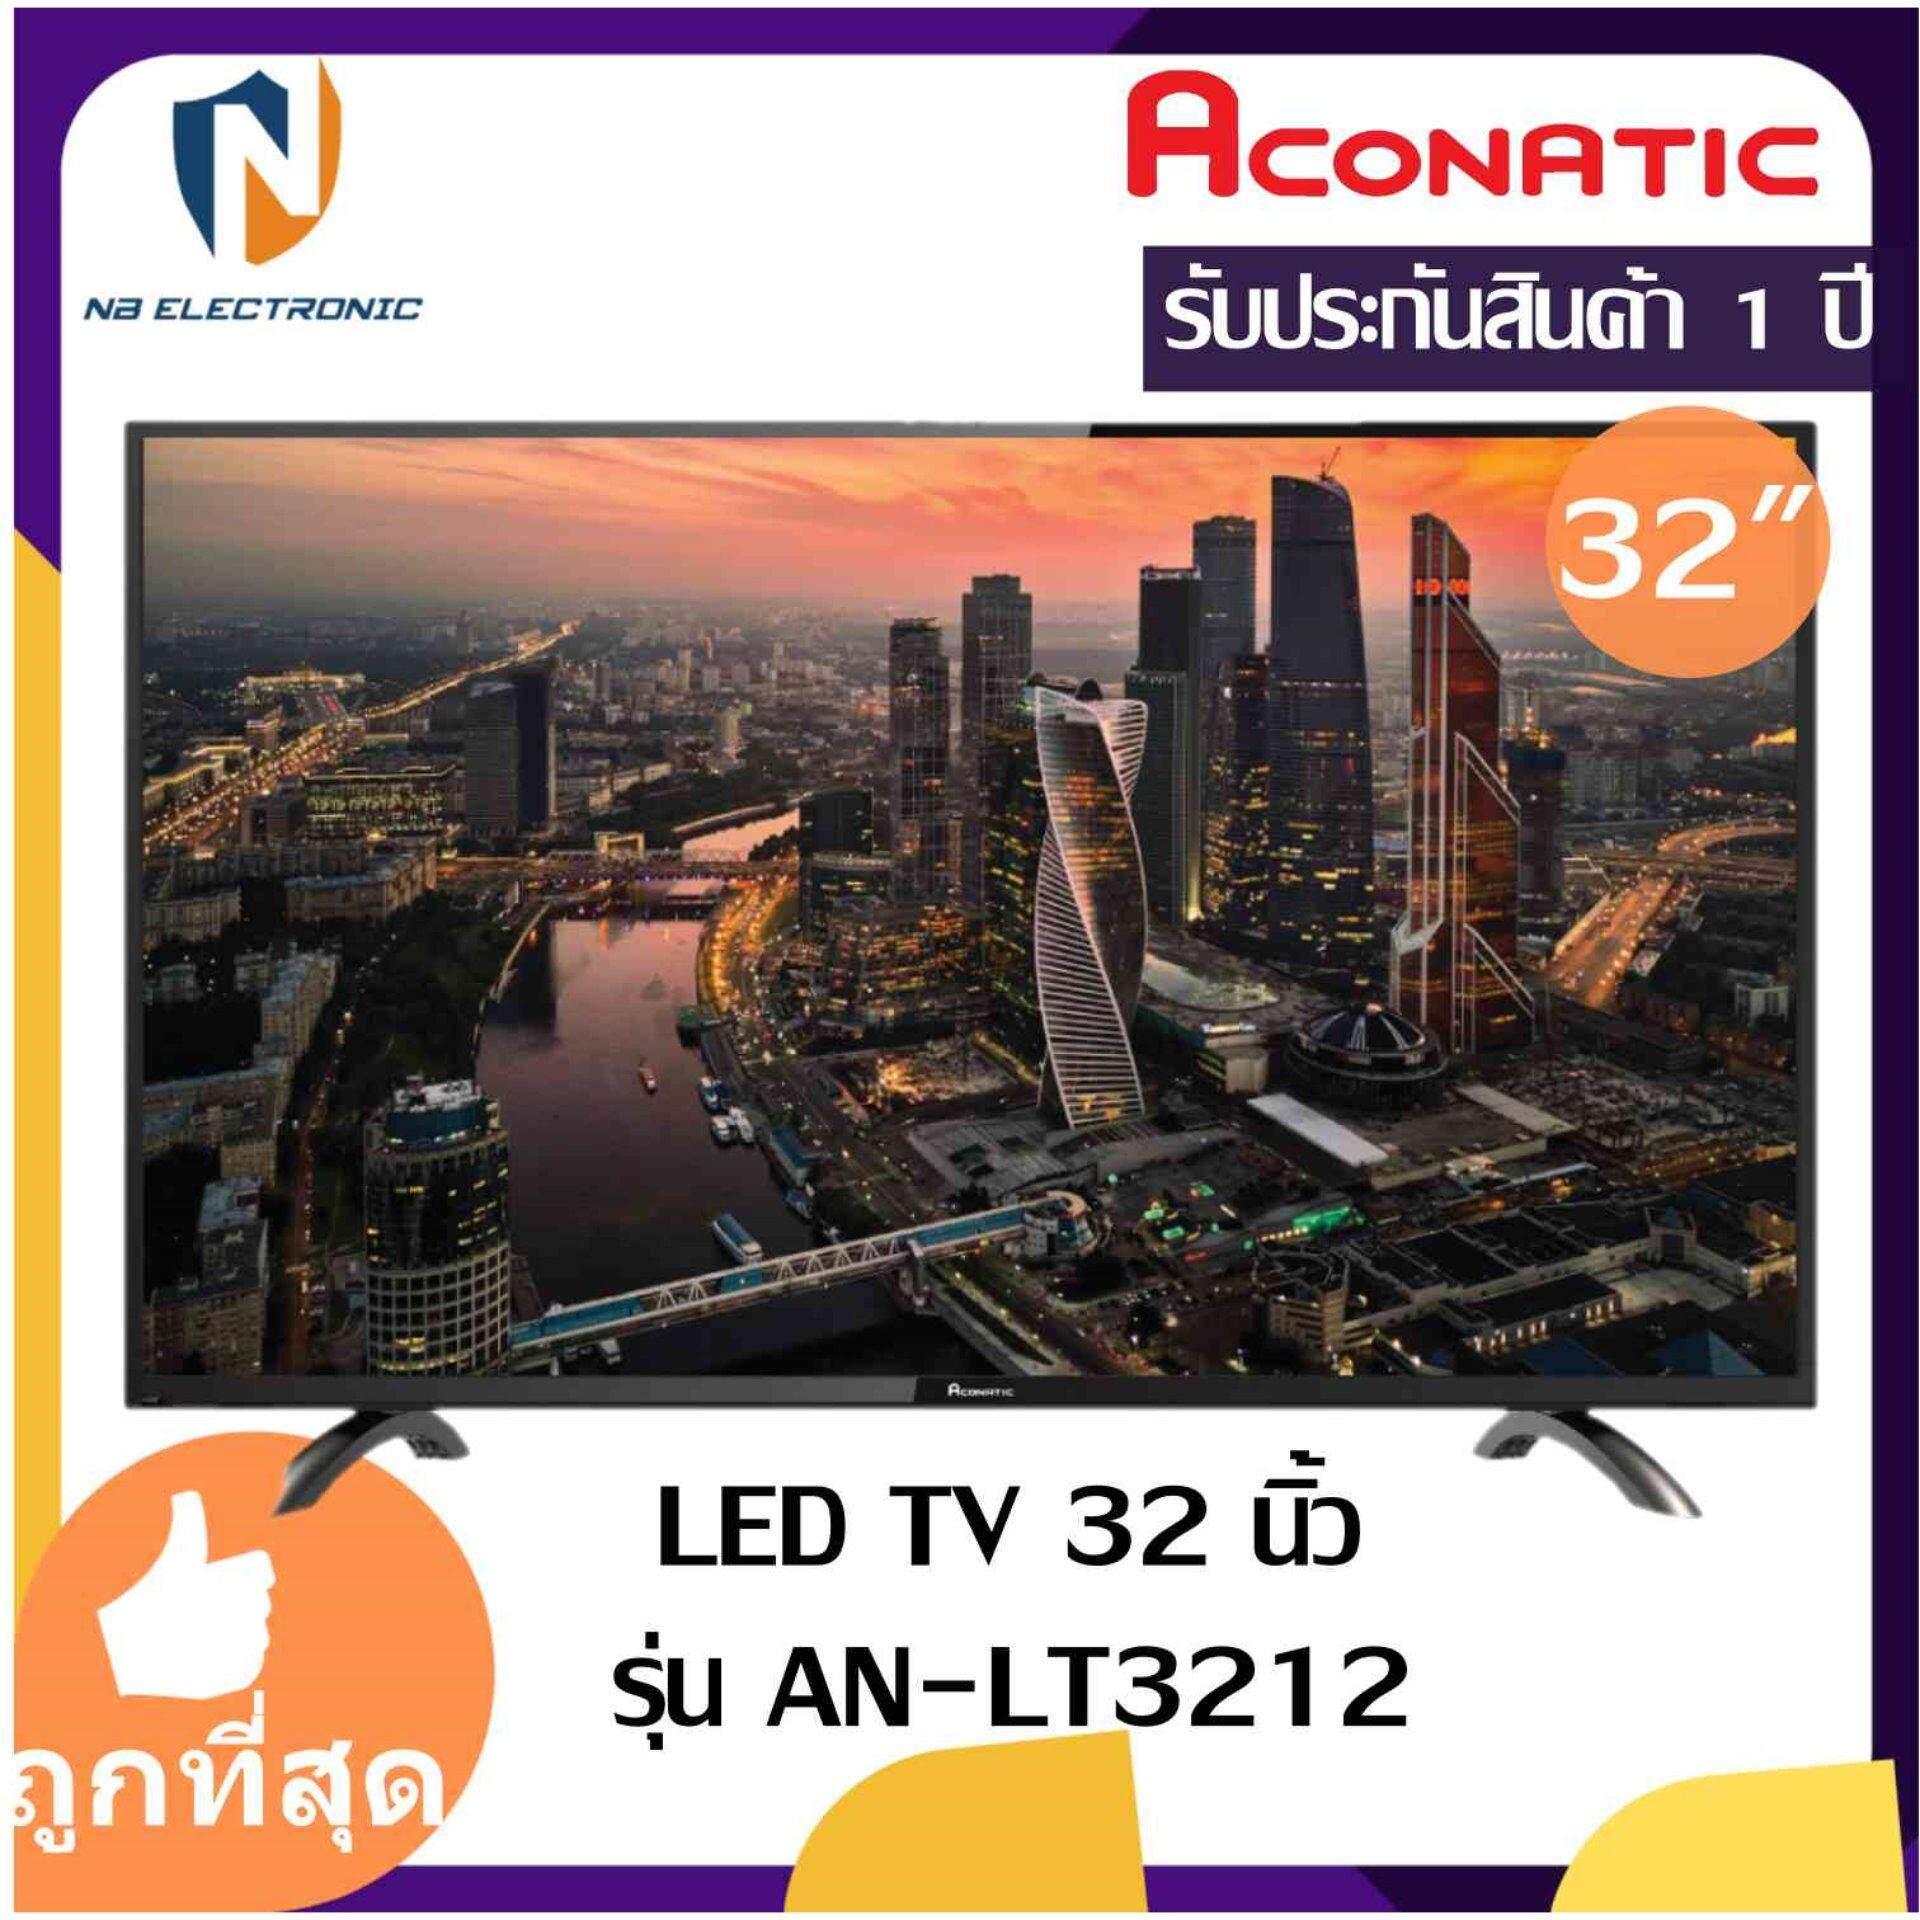 ACONATIC แอลอีดีทีวี 32 นิ้ว รุ่น AN-LT3212